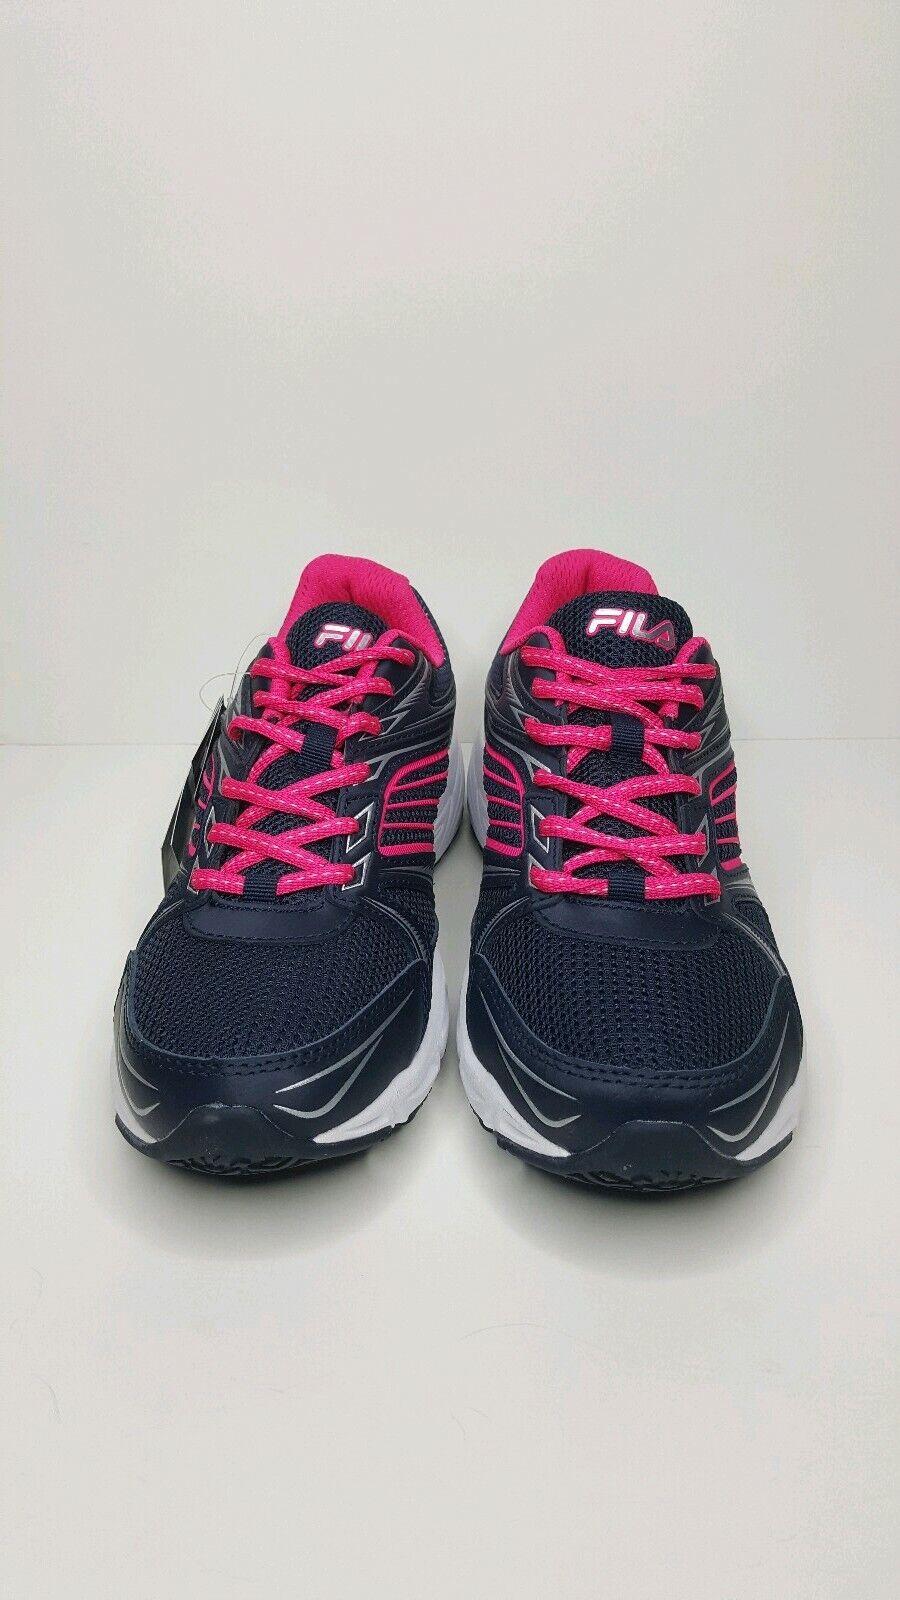 Fila Womens Fresh 3 Running shoes Cool Max DLS Foam Size 6.5